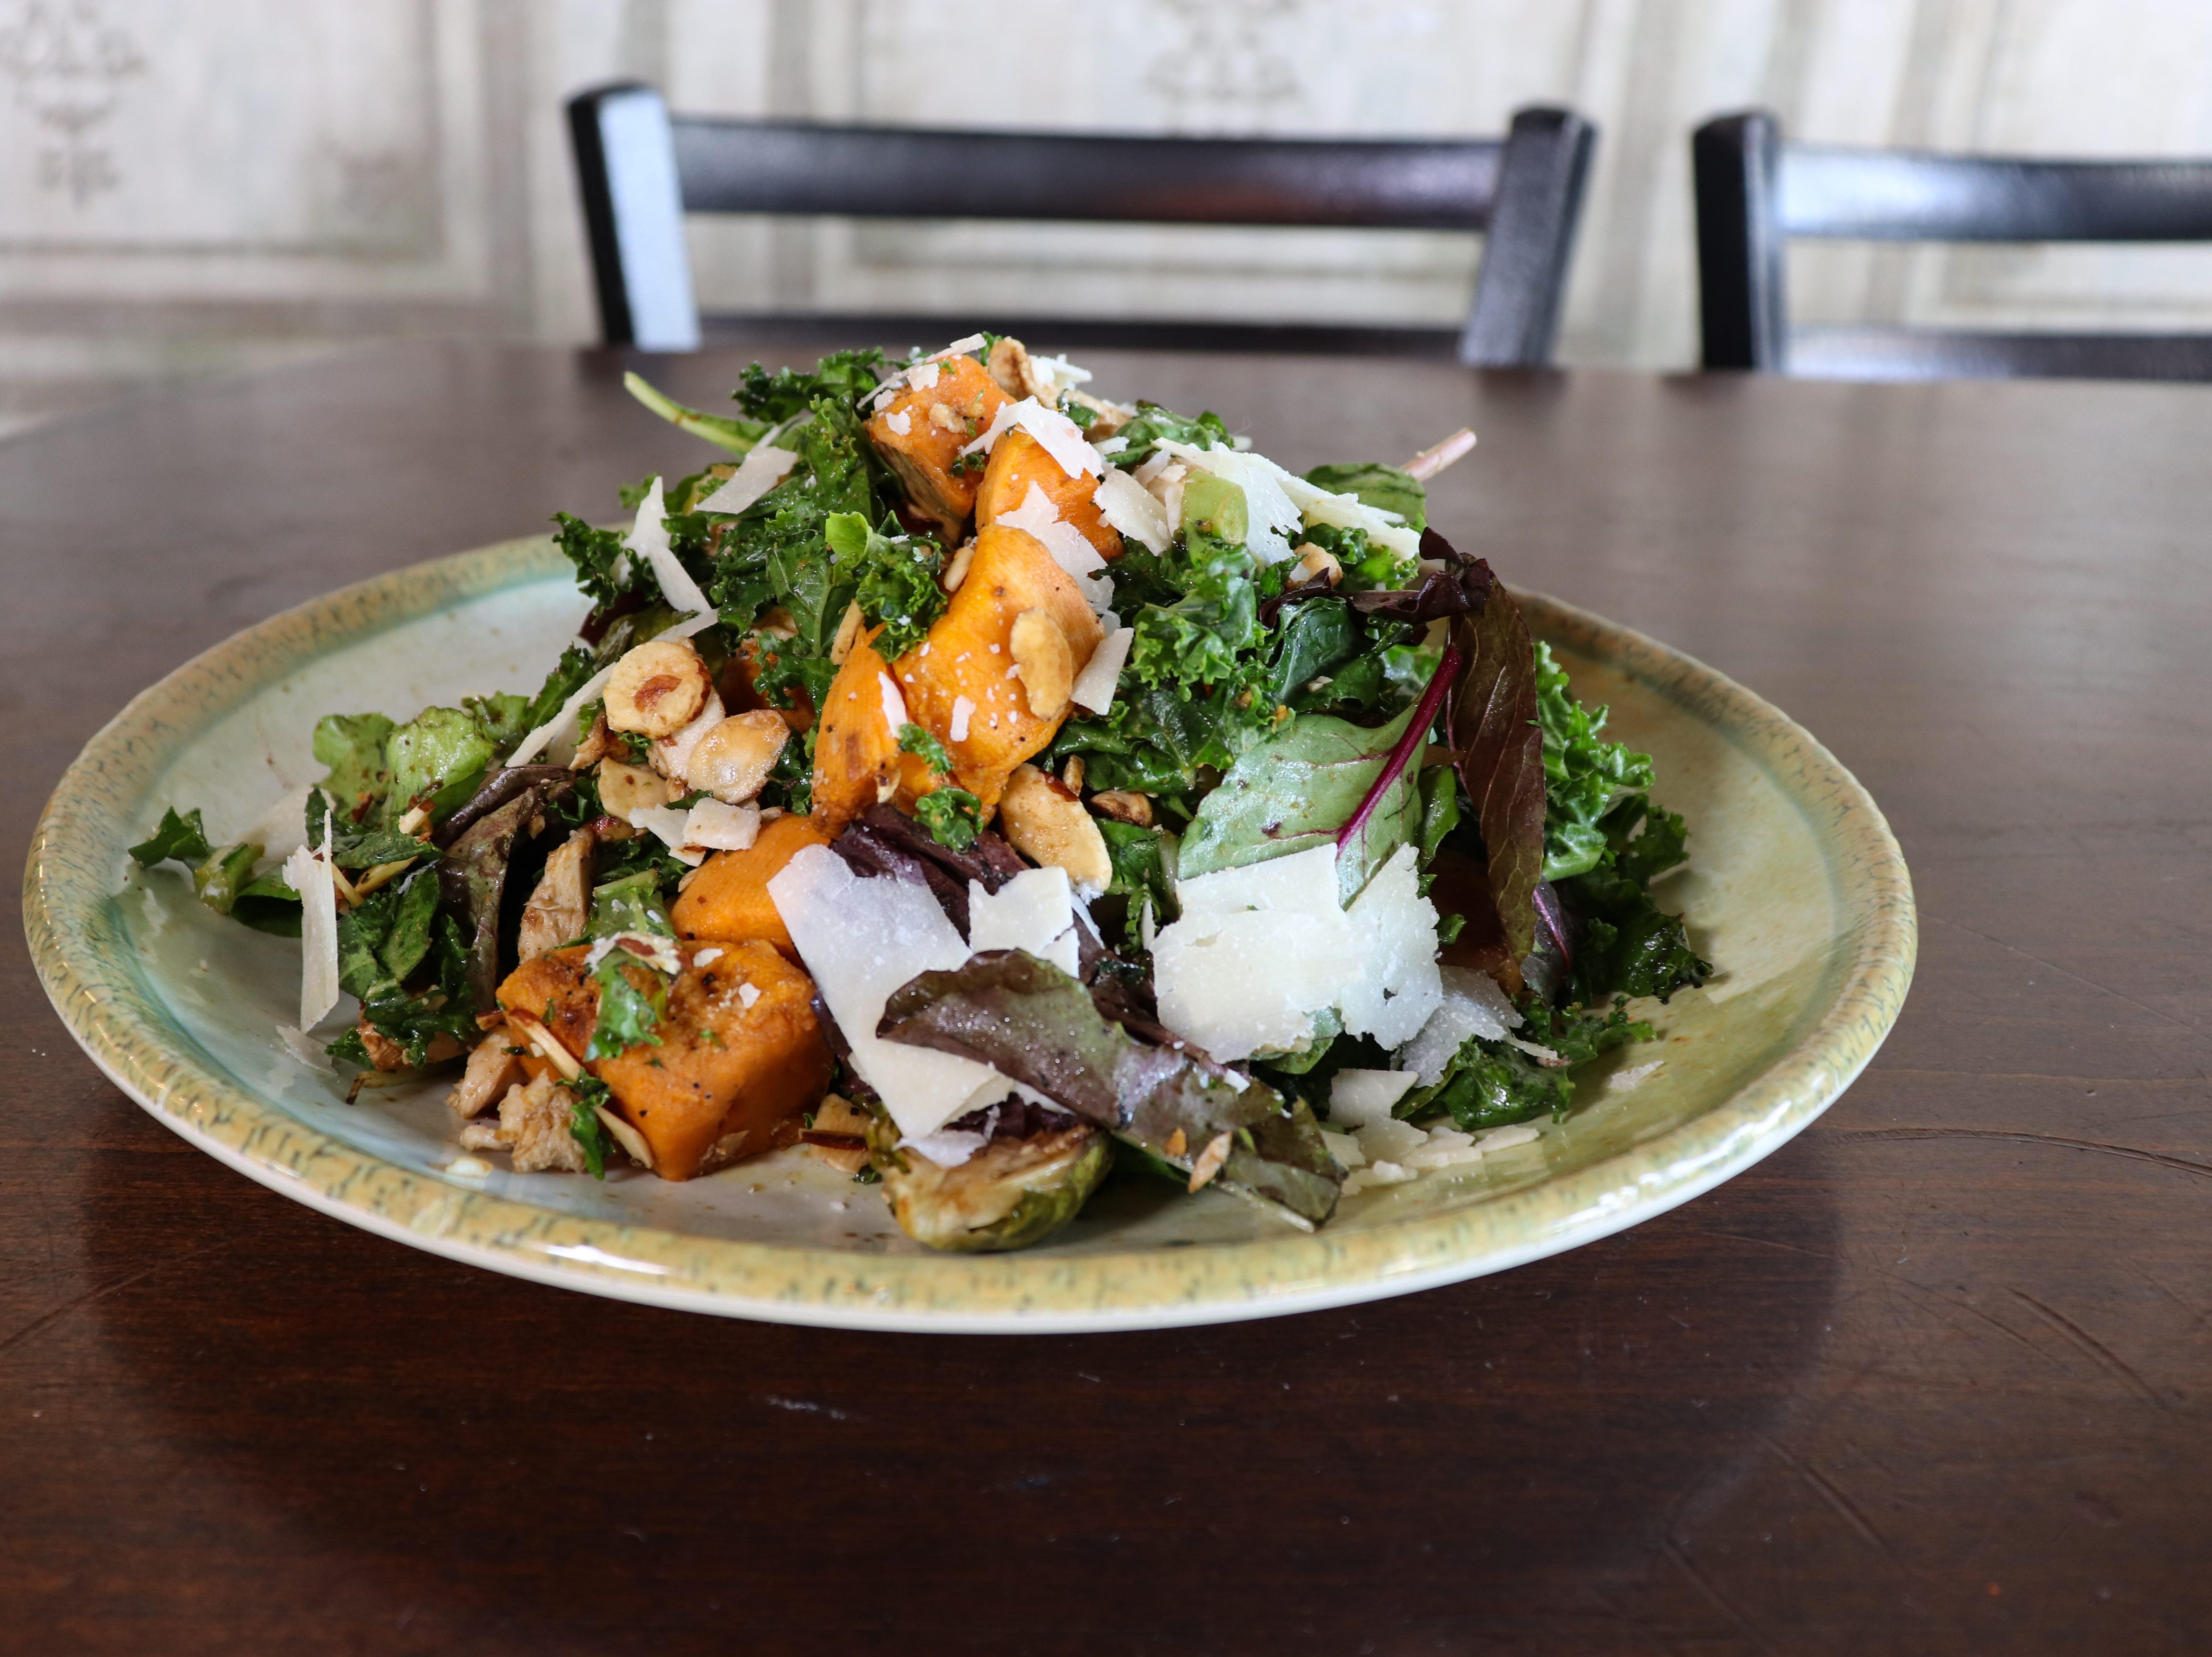 The Goodness Greeness salad at Crust Pizzeria and Italian Restaurant.